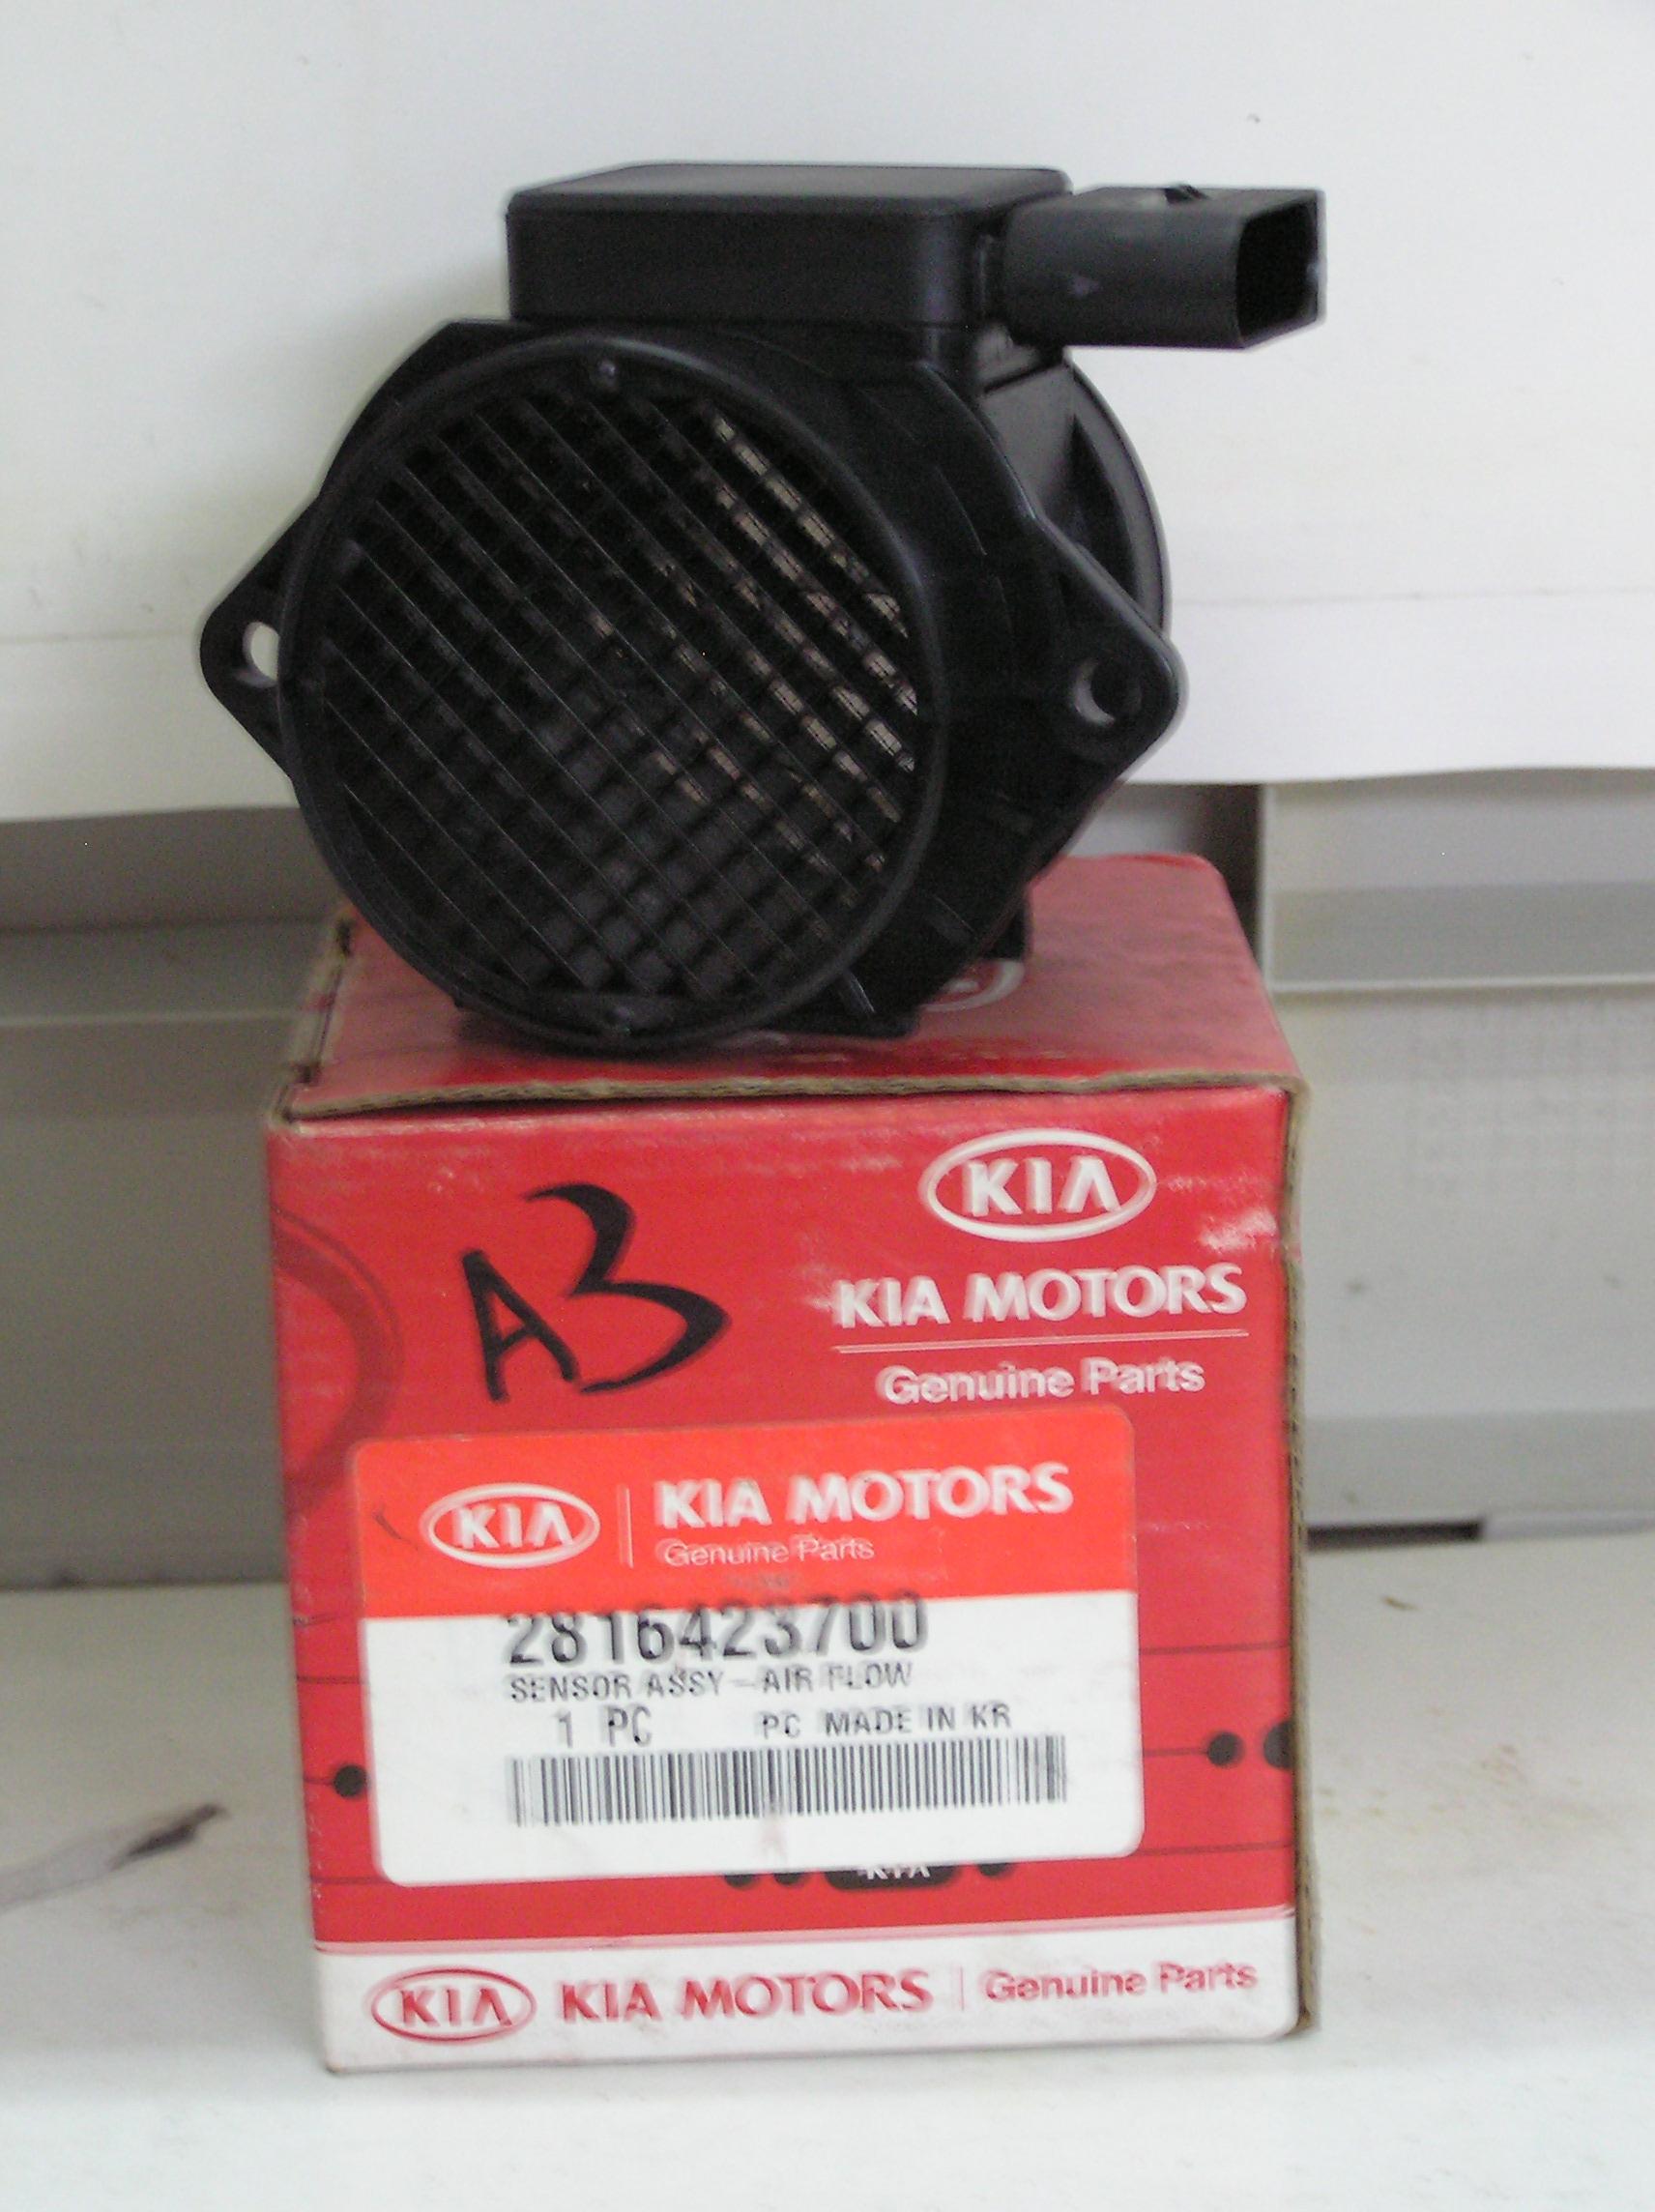 Kia Spectra 1600cc Korea Spare Parts Malaysiakuala Lumpur Rio M Air Flow Sensor Location Mass Meter Spectra5 Hyundai Citra Trajet 20 2816423700